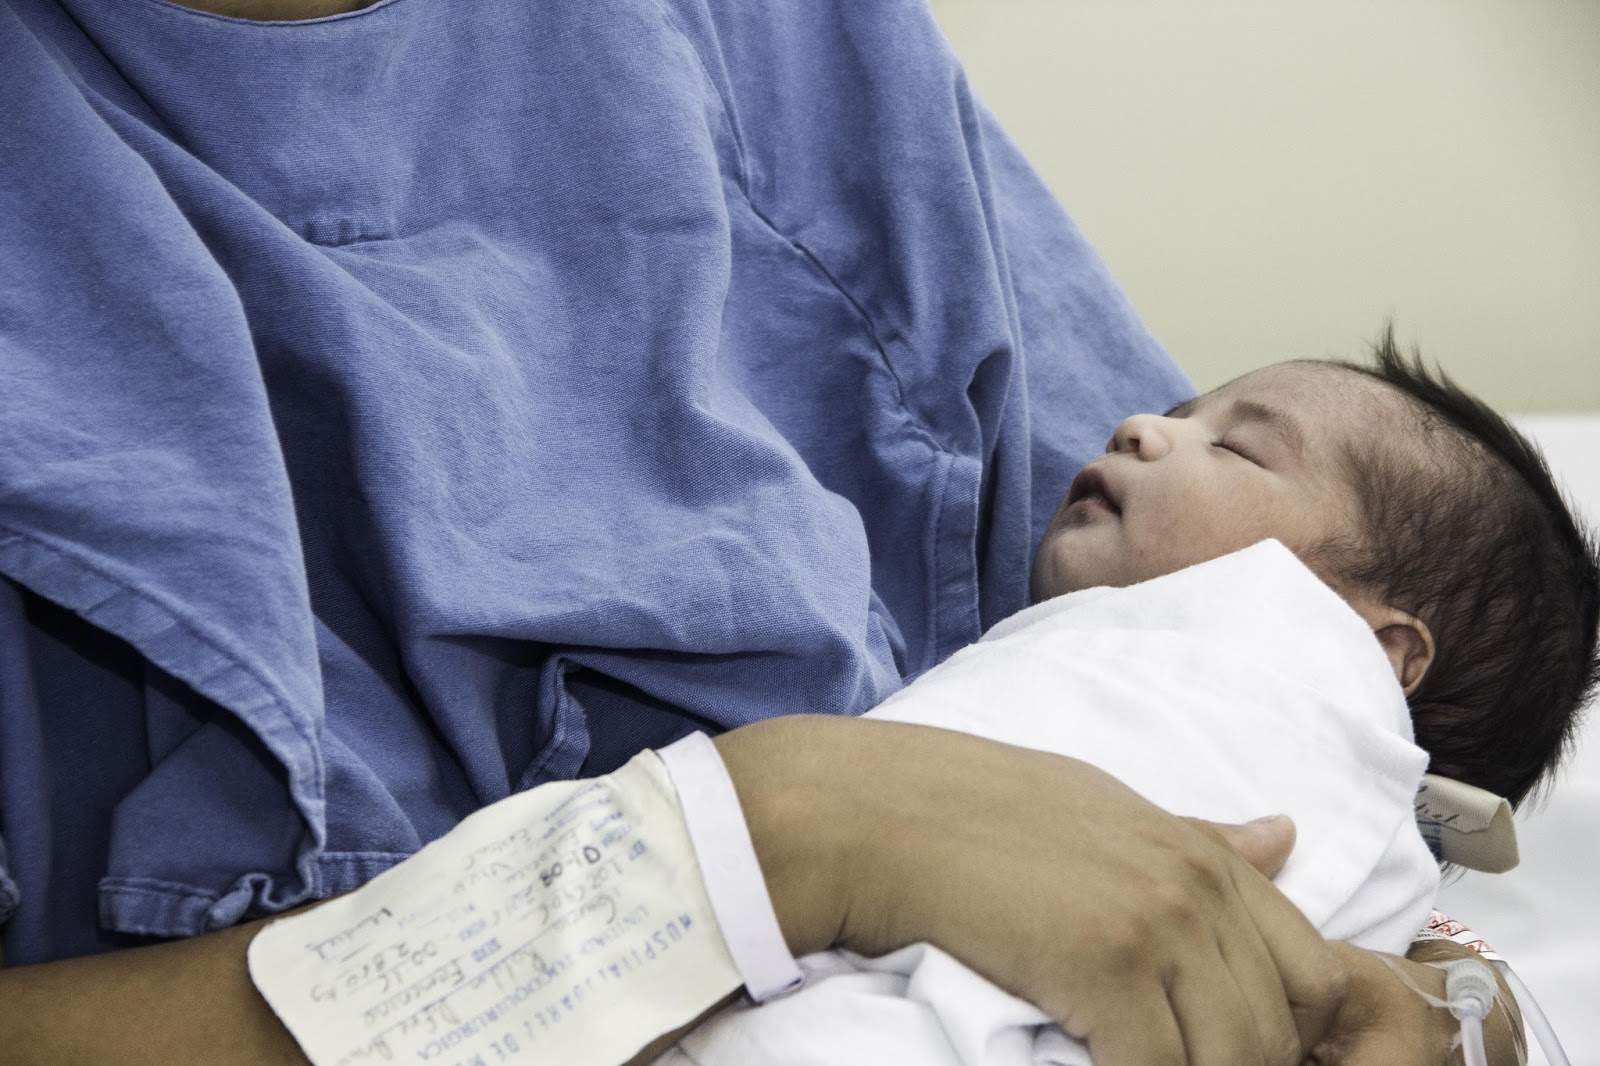 Nacen 3 bebés el primer día del 2017